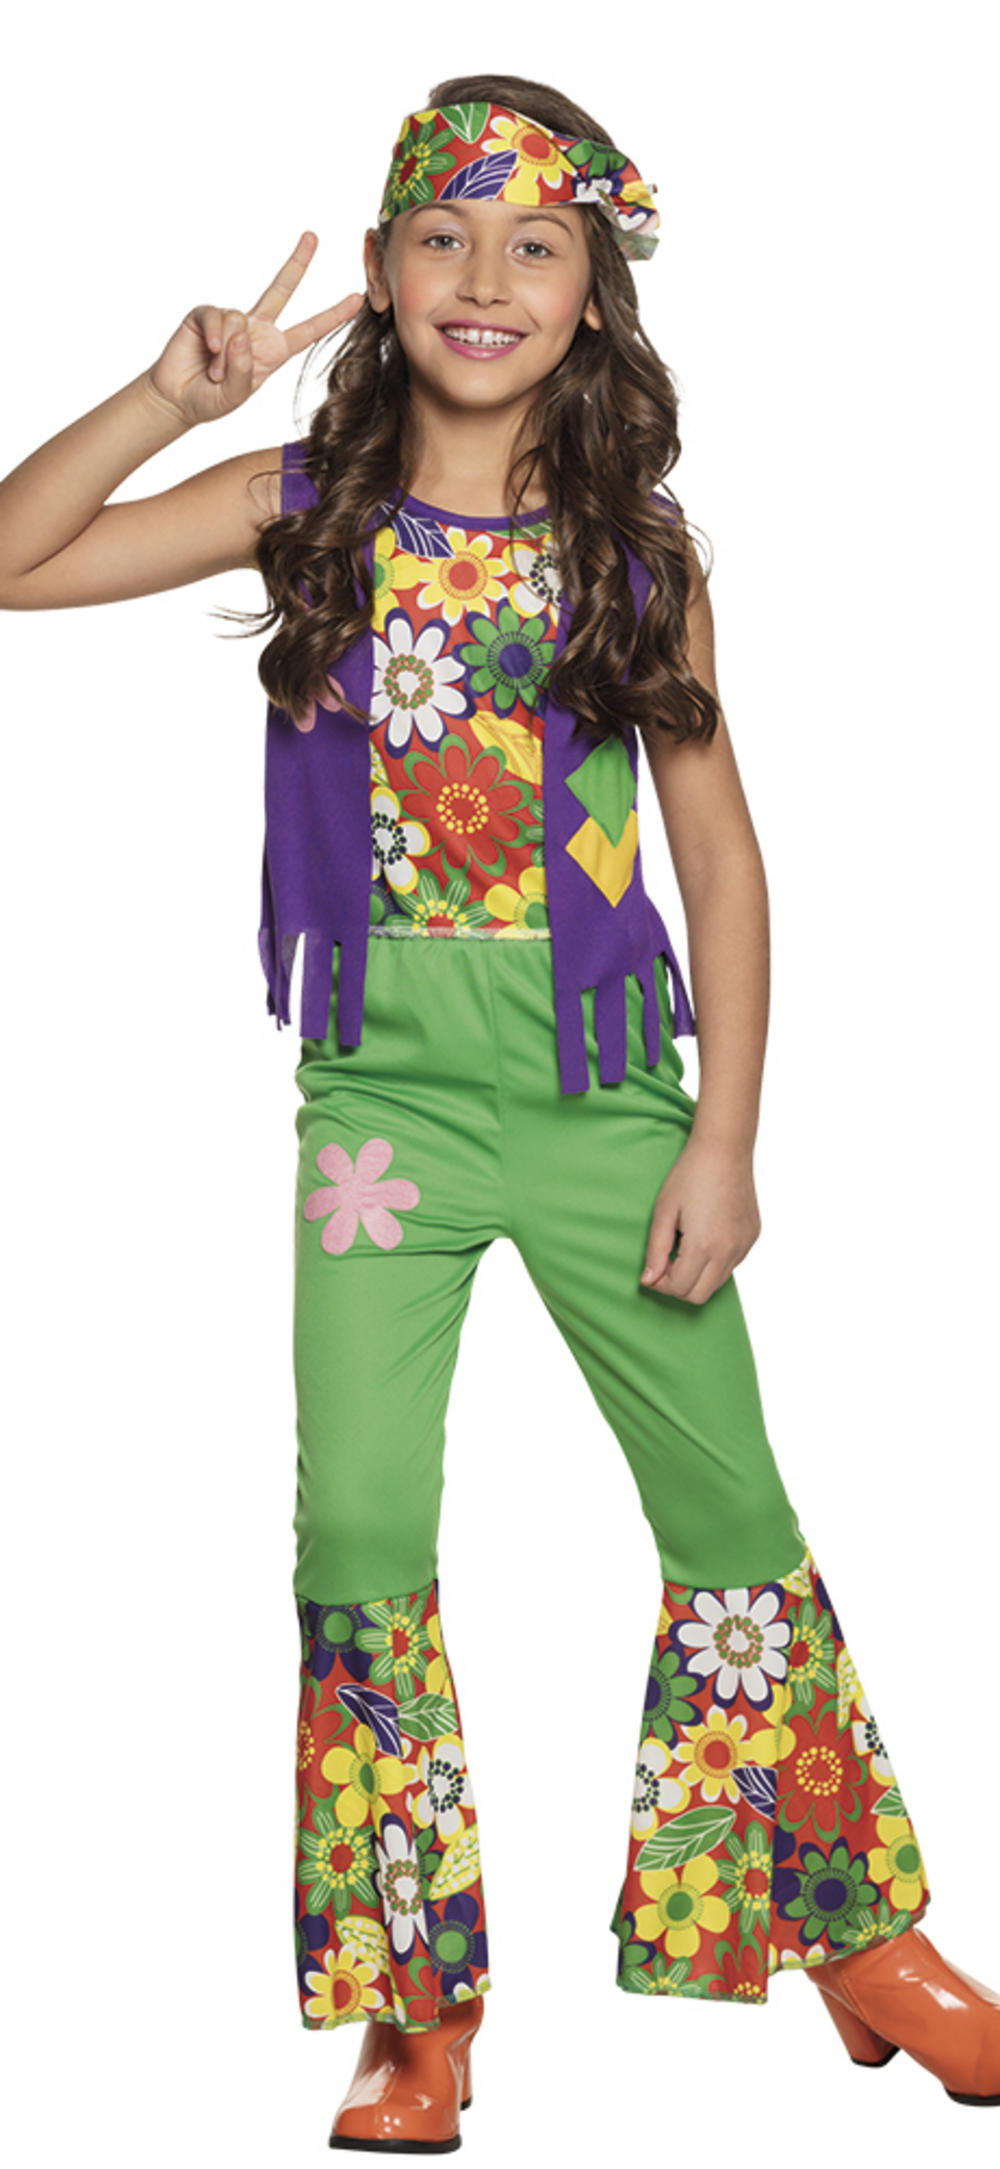 Woodstock Girls Costume